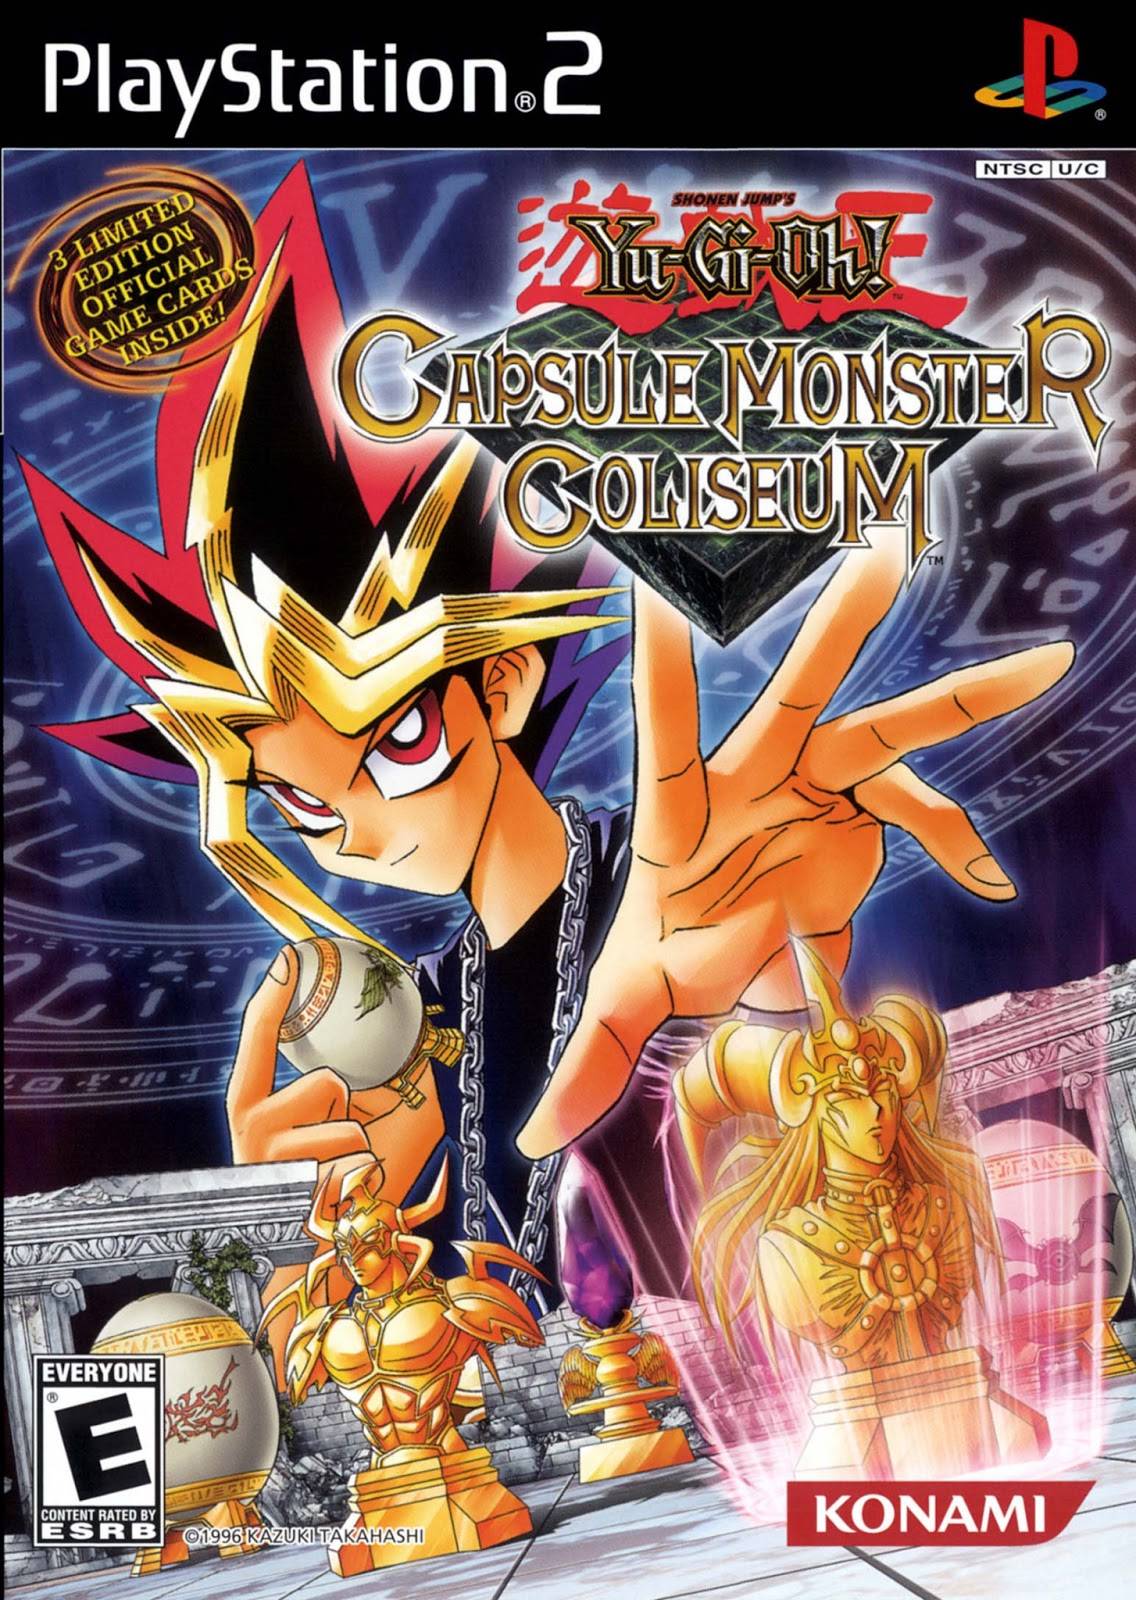 [PS2] Yu-Gi-Oh! Capsule Monster Coliseum ~ Hiero's ISO ...